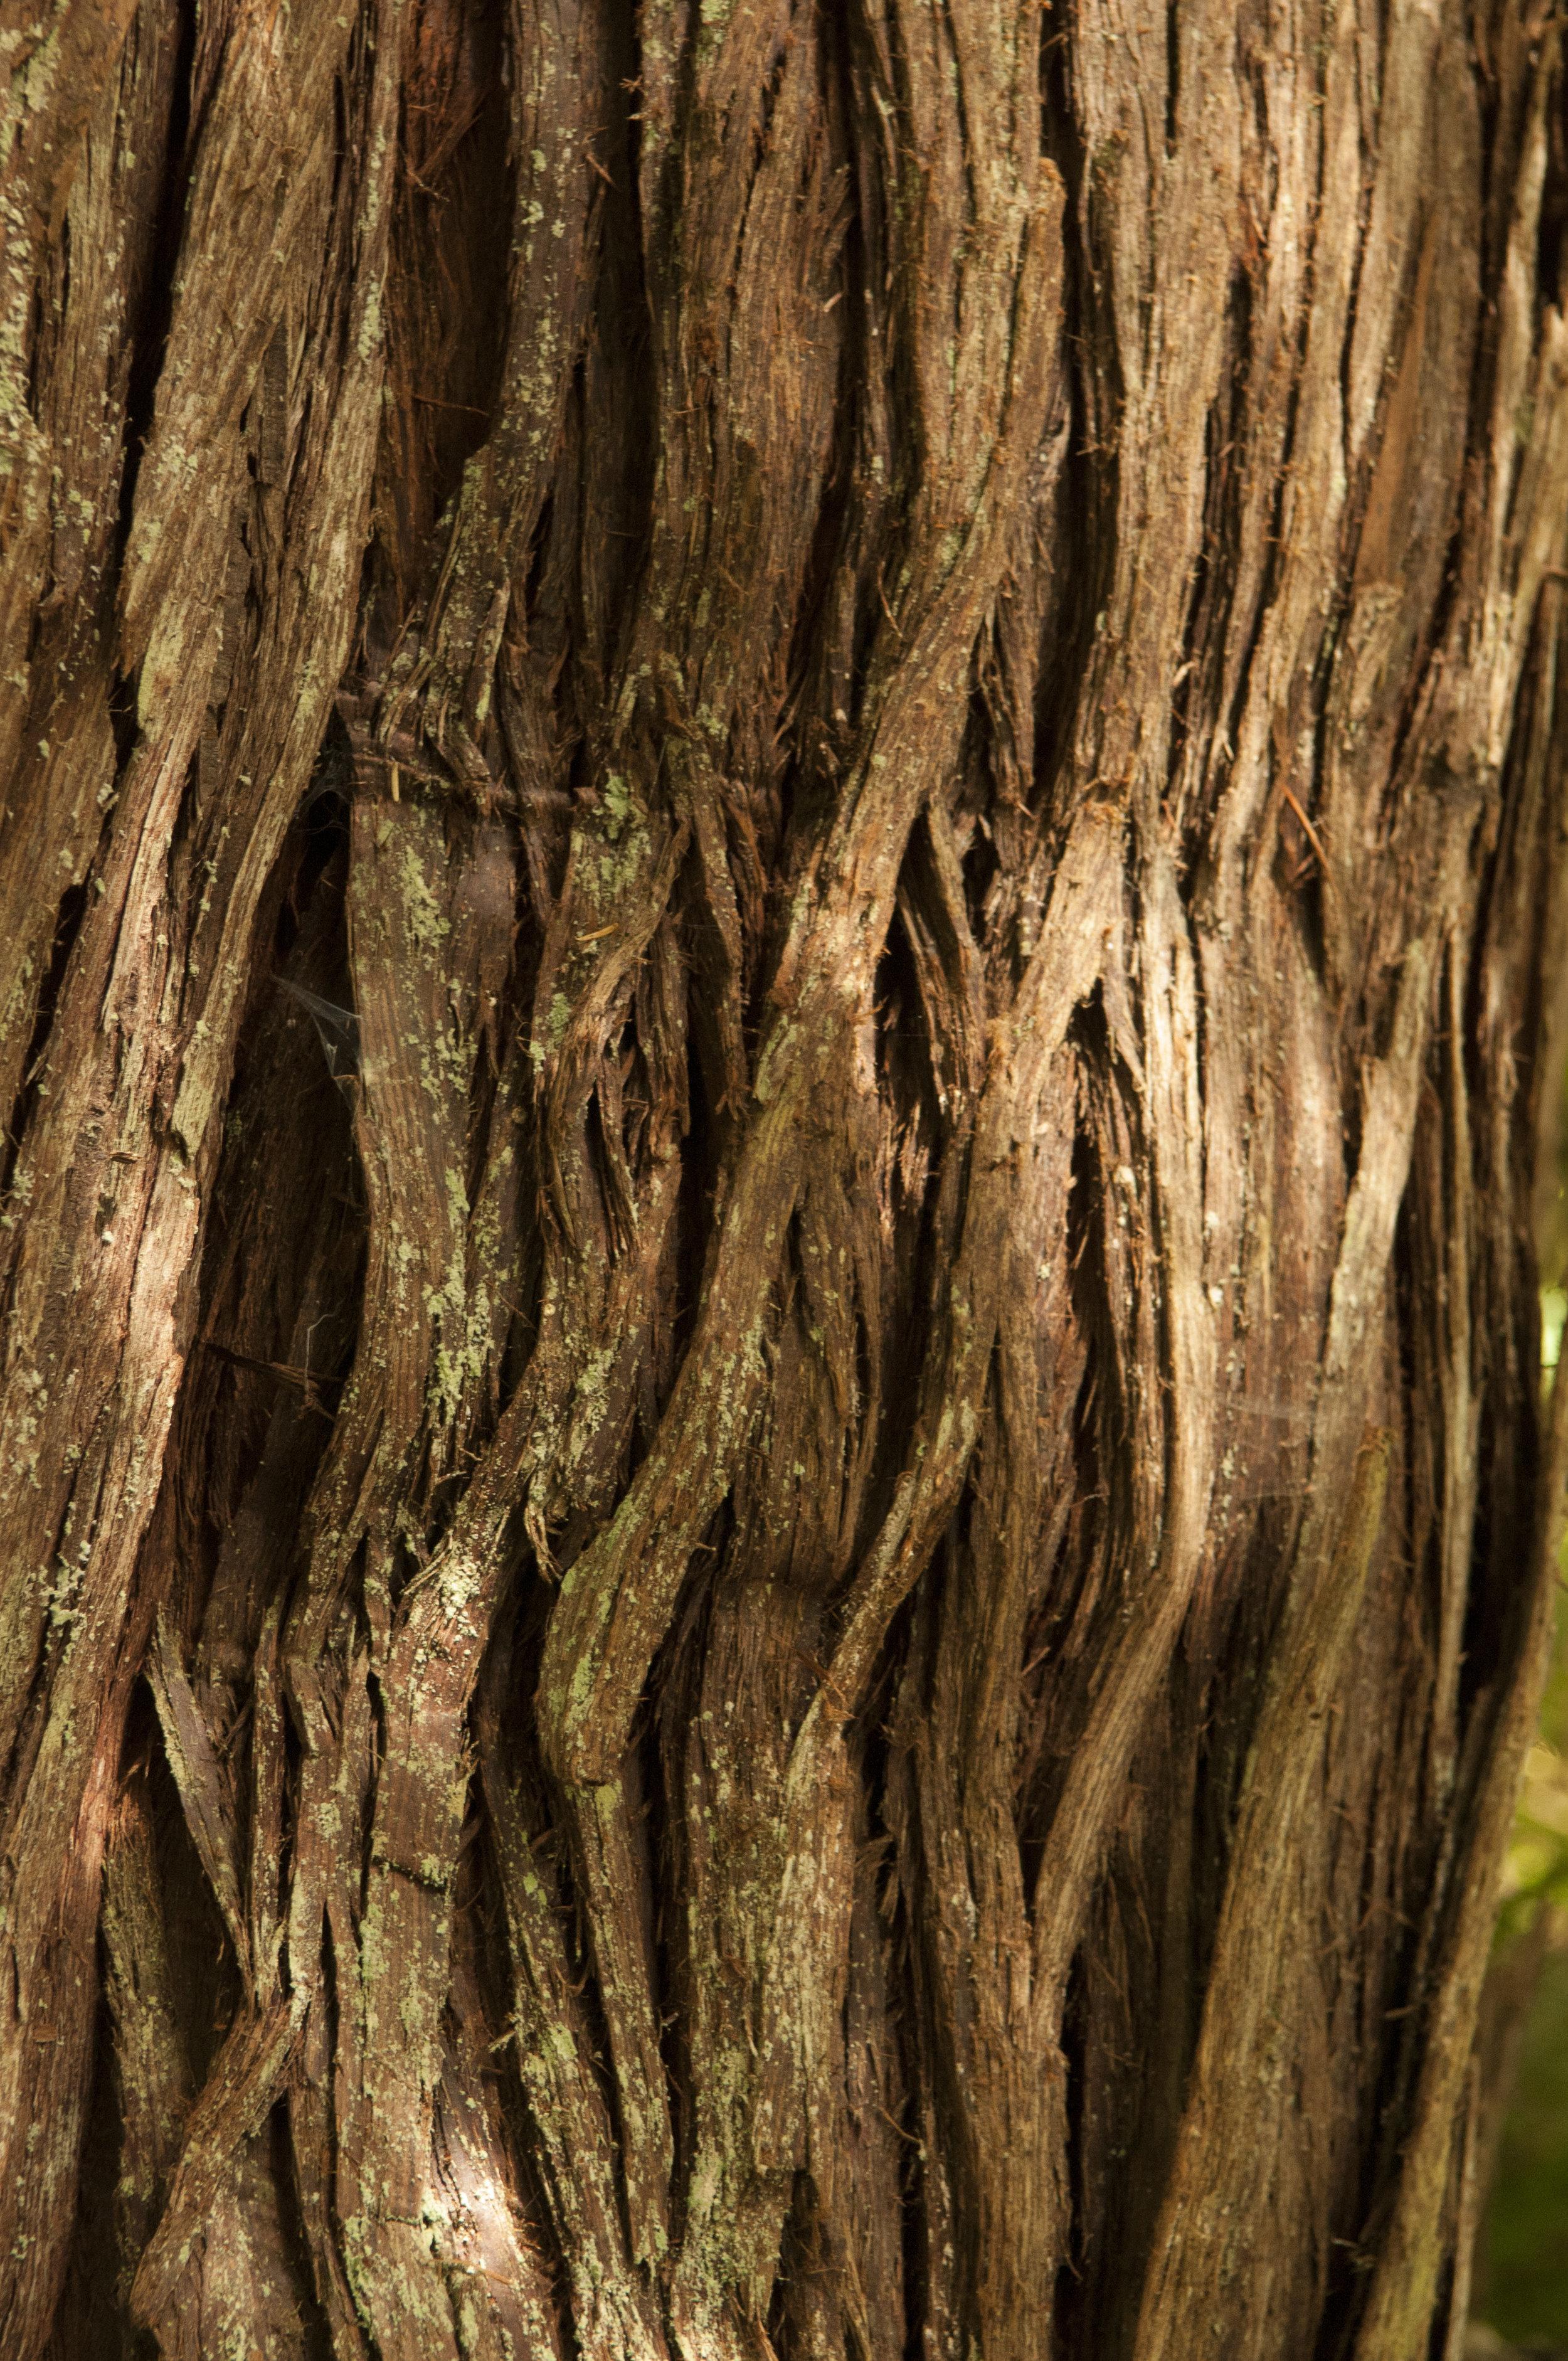 Closeup of a Western red cedar. Photo by Nikolaj Lasbo